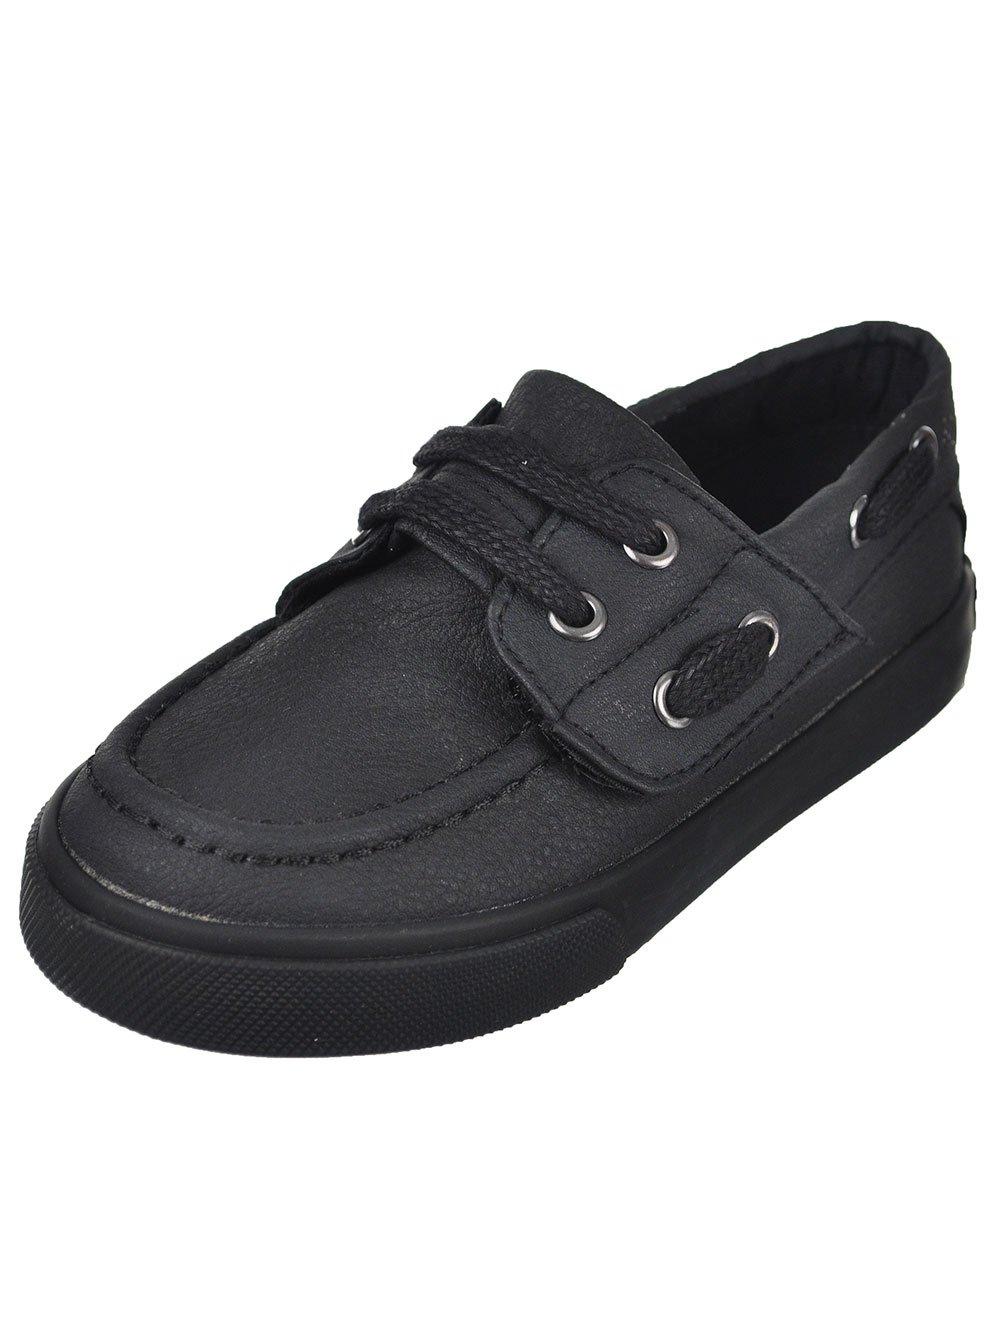 French Toast Boys Toddler Lil Jacob Uniform Dress Shoe Black 5